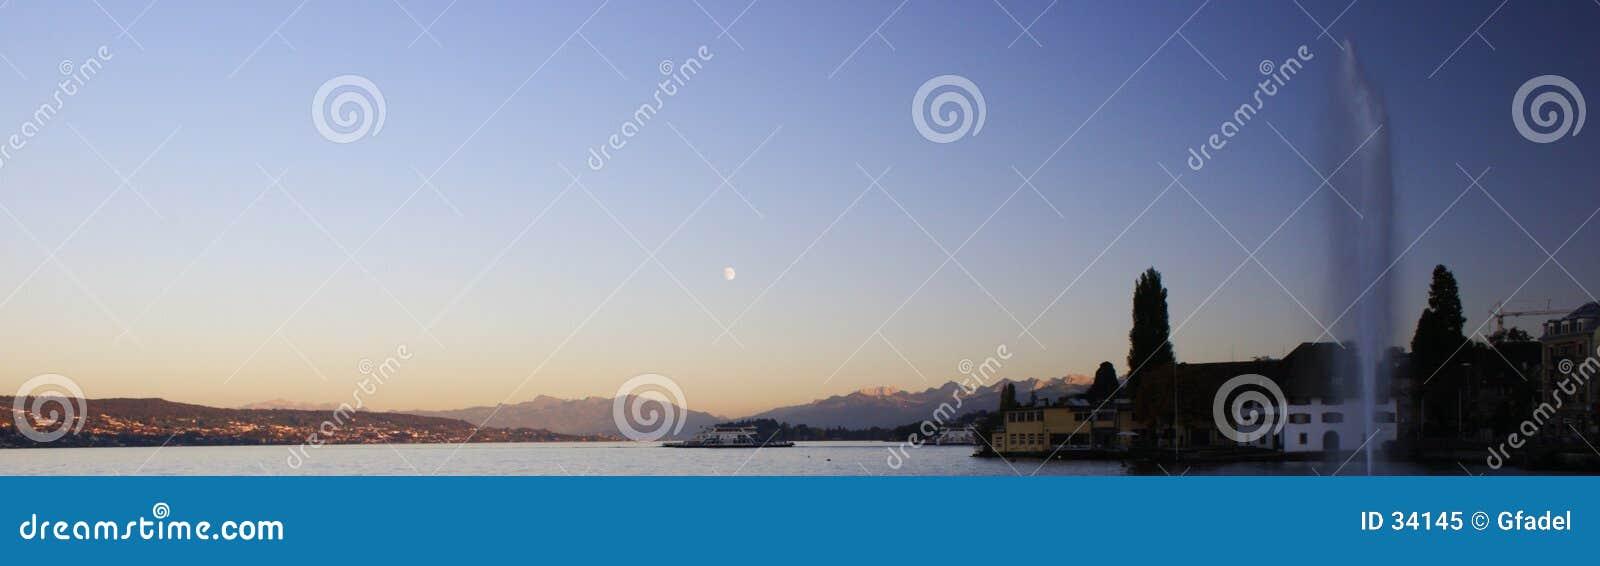 Sunset - Panorama